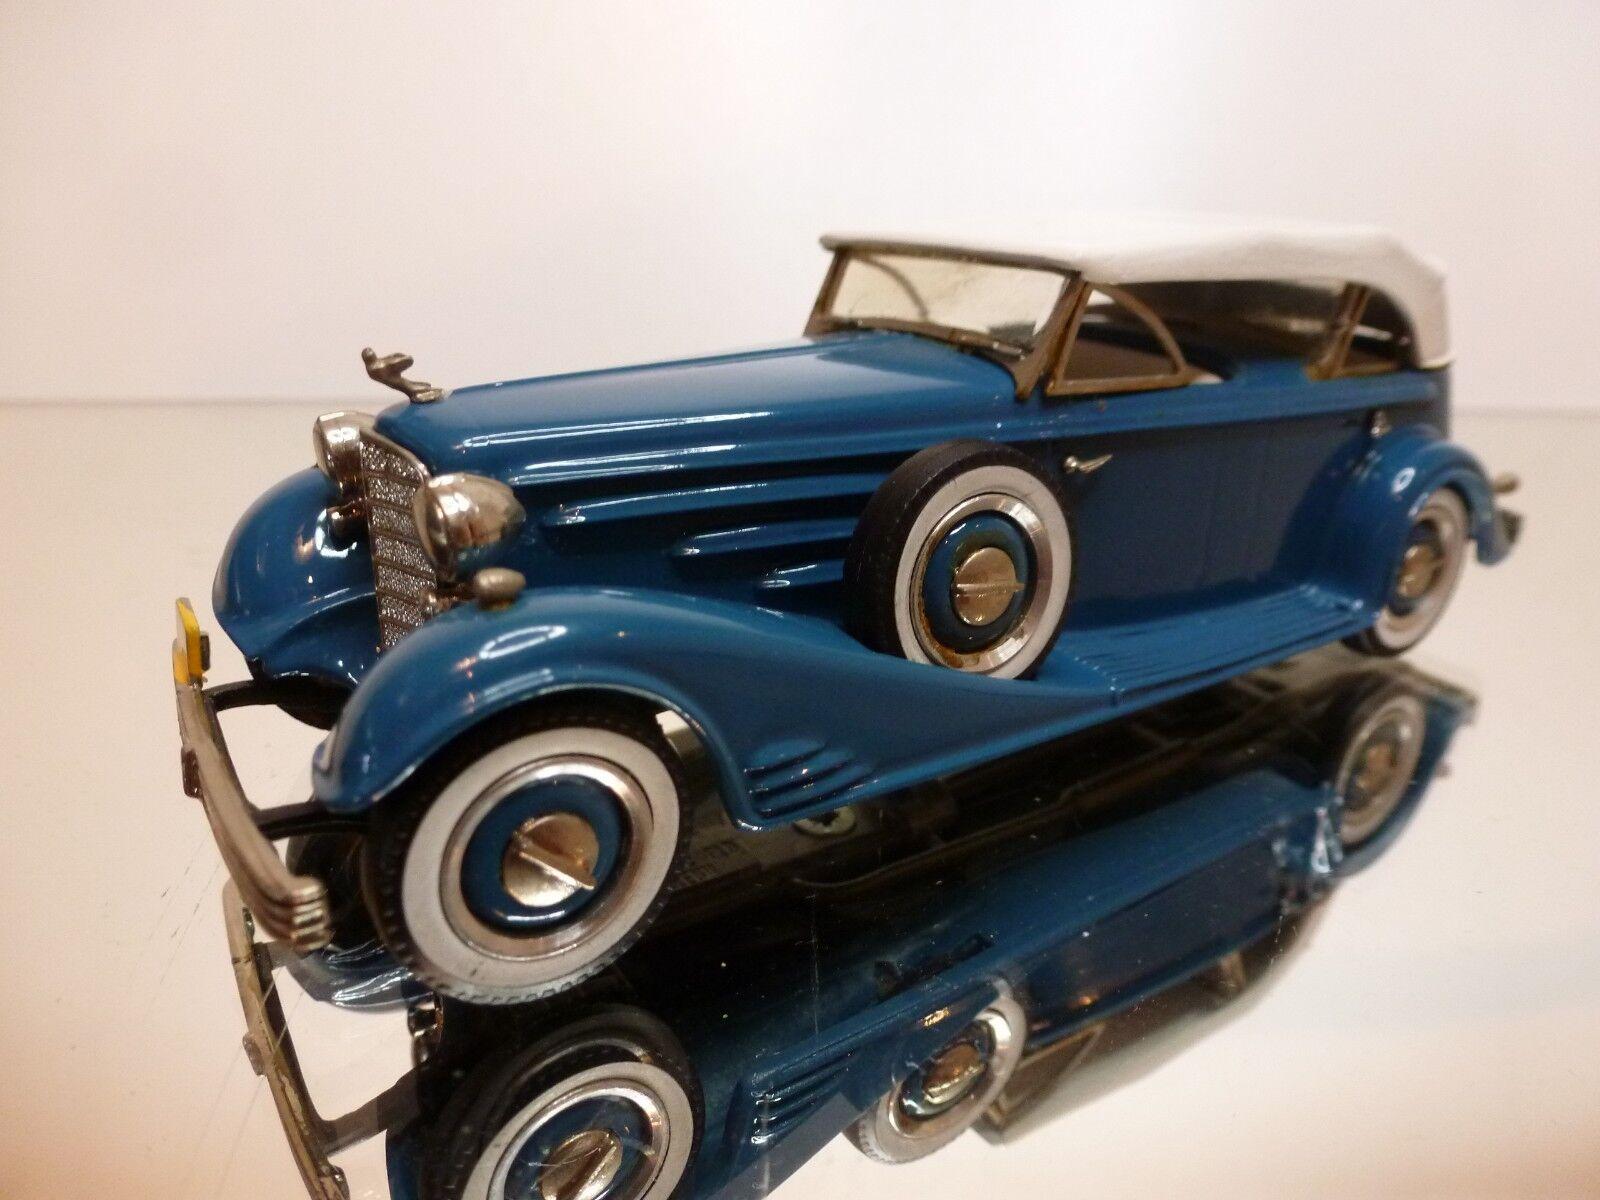 WESTERN MODELS CADILLAC V16 CONverdeIBLE VICTORIA 1933 - 1 43 - EXCELLENT - 7